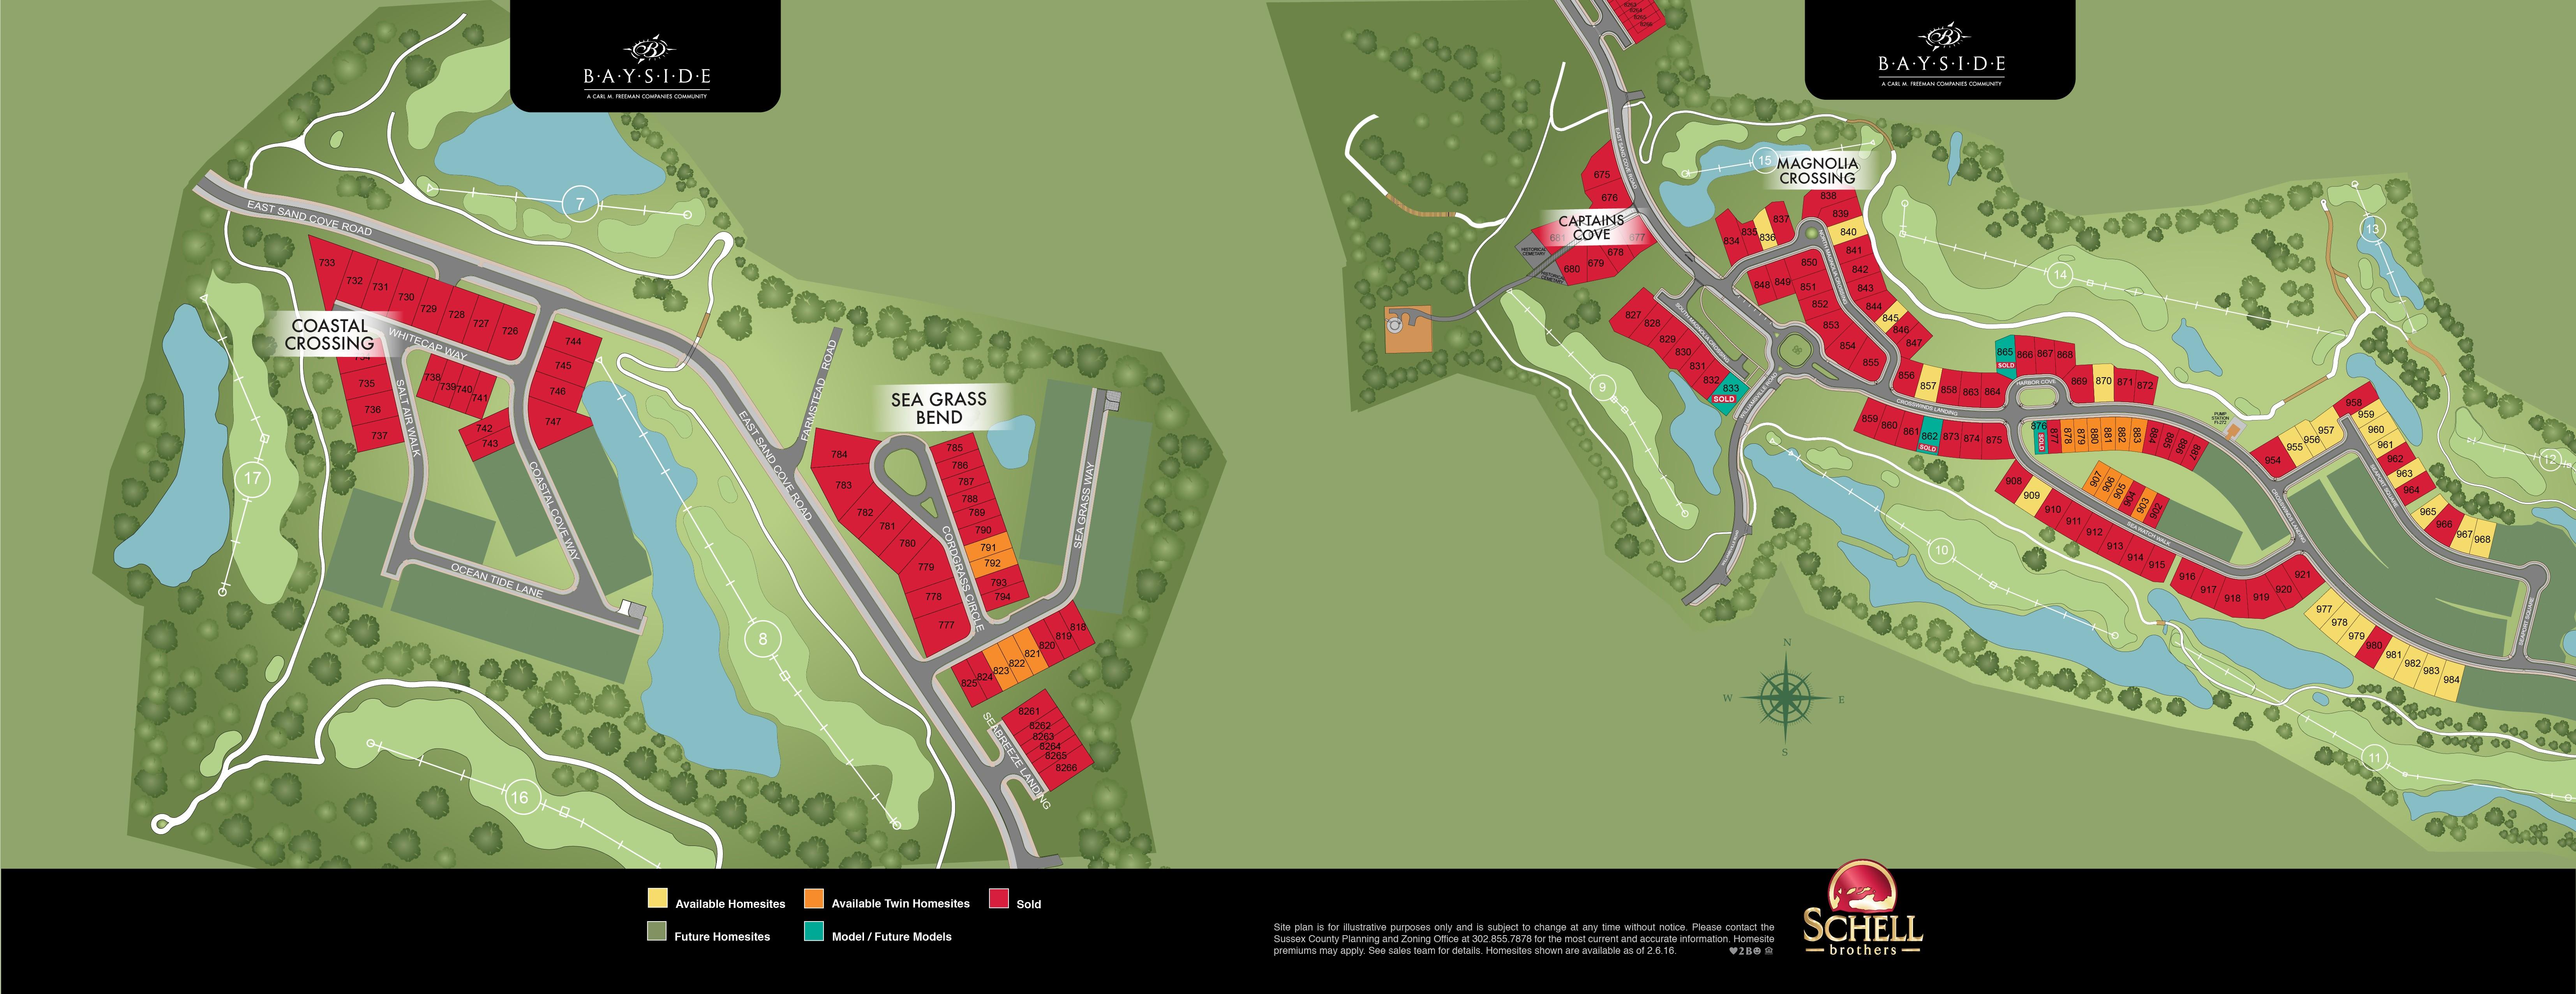 Bayside Community Map